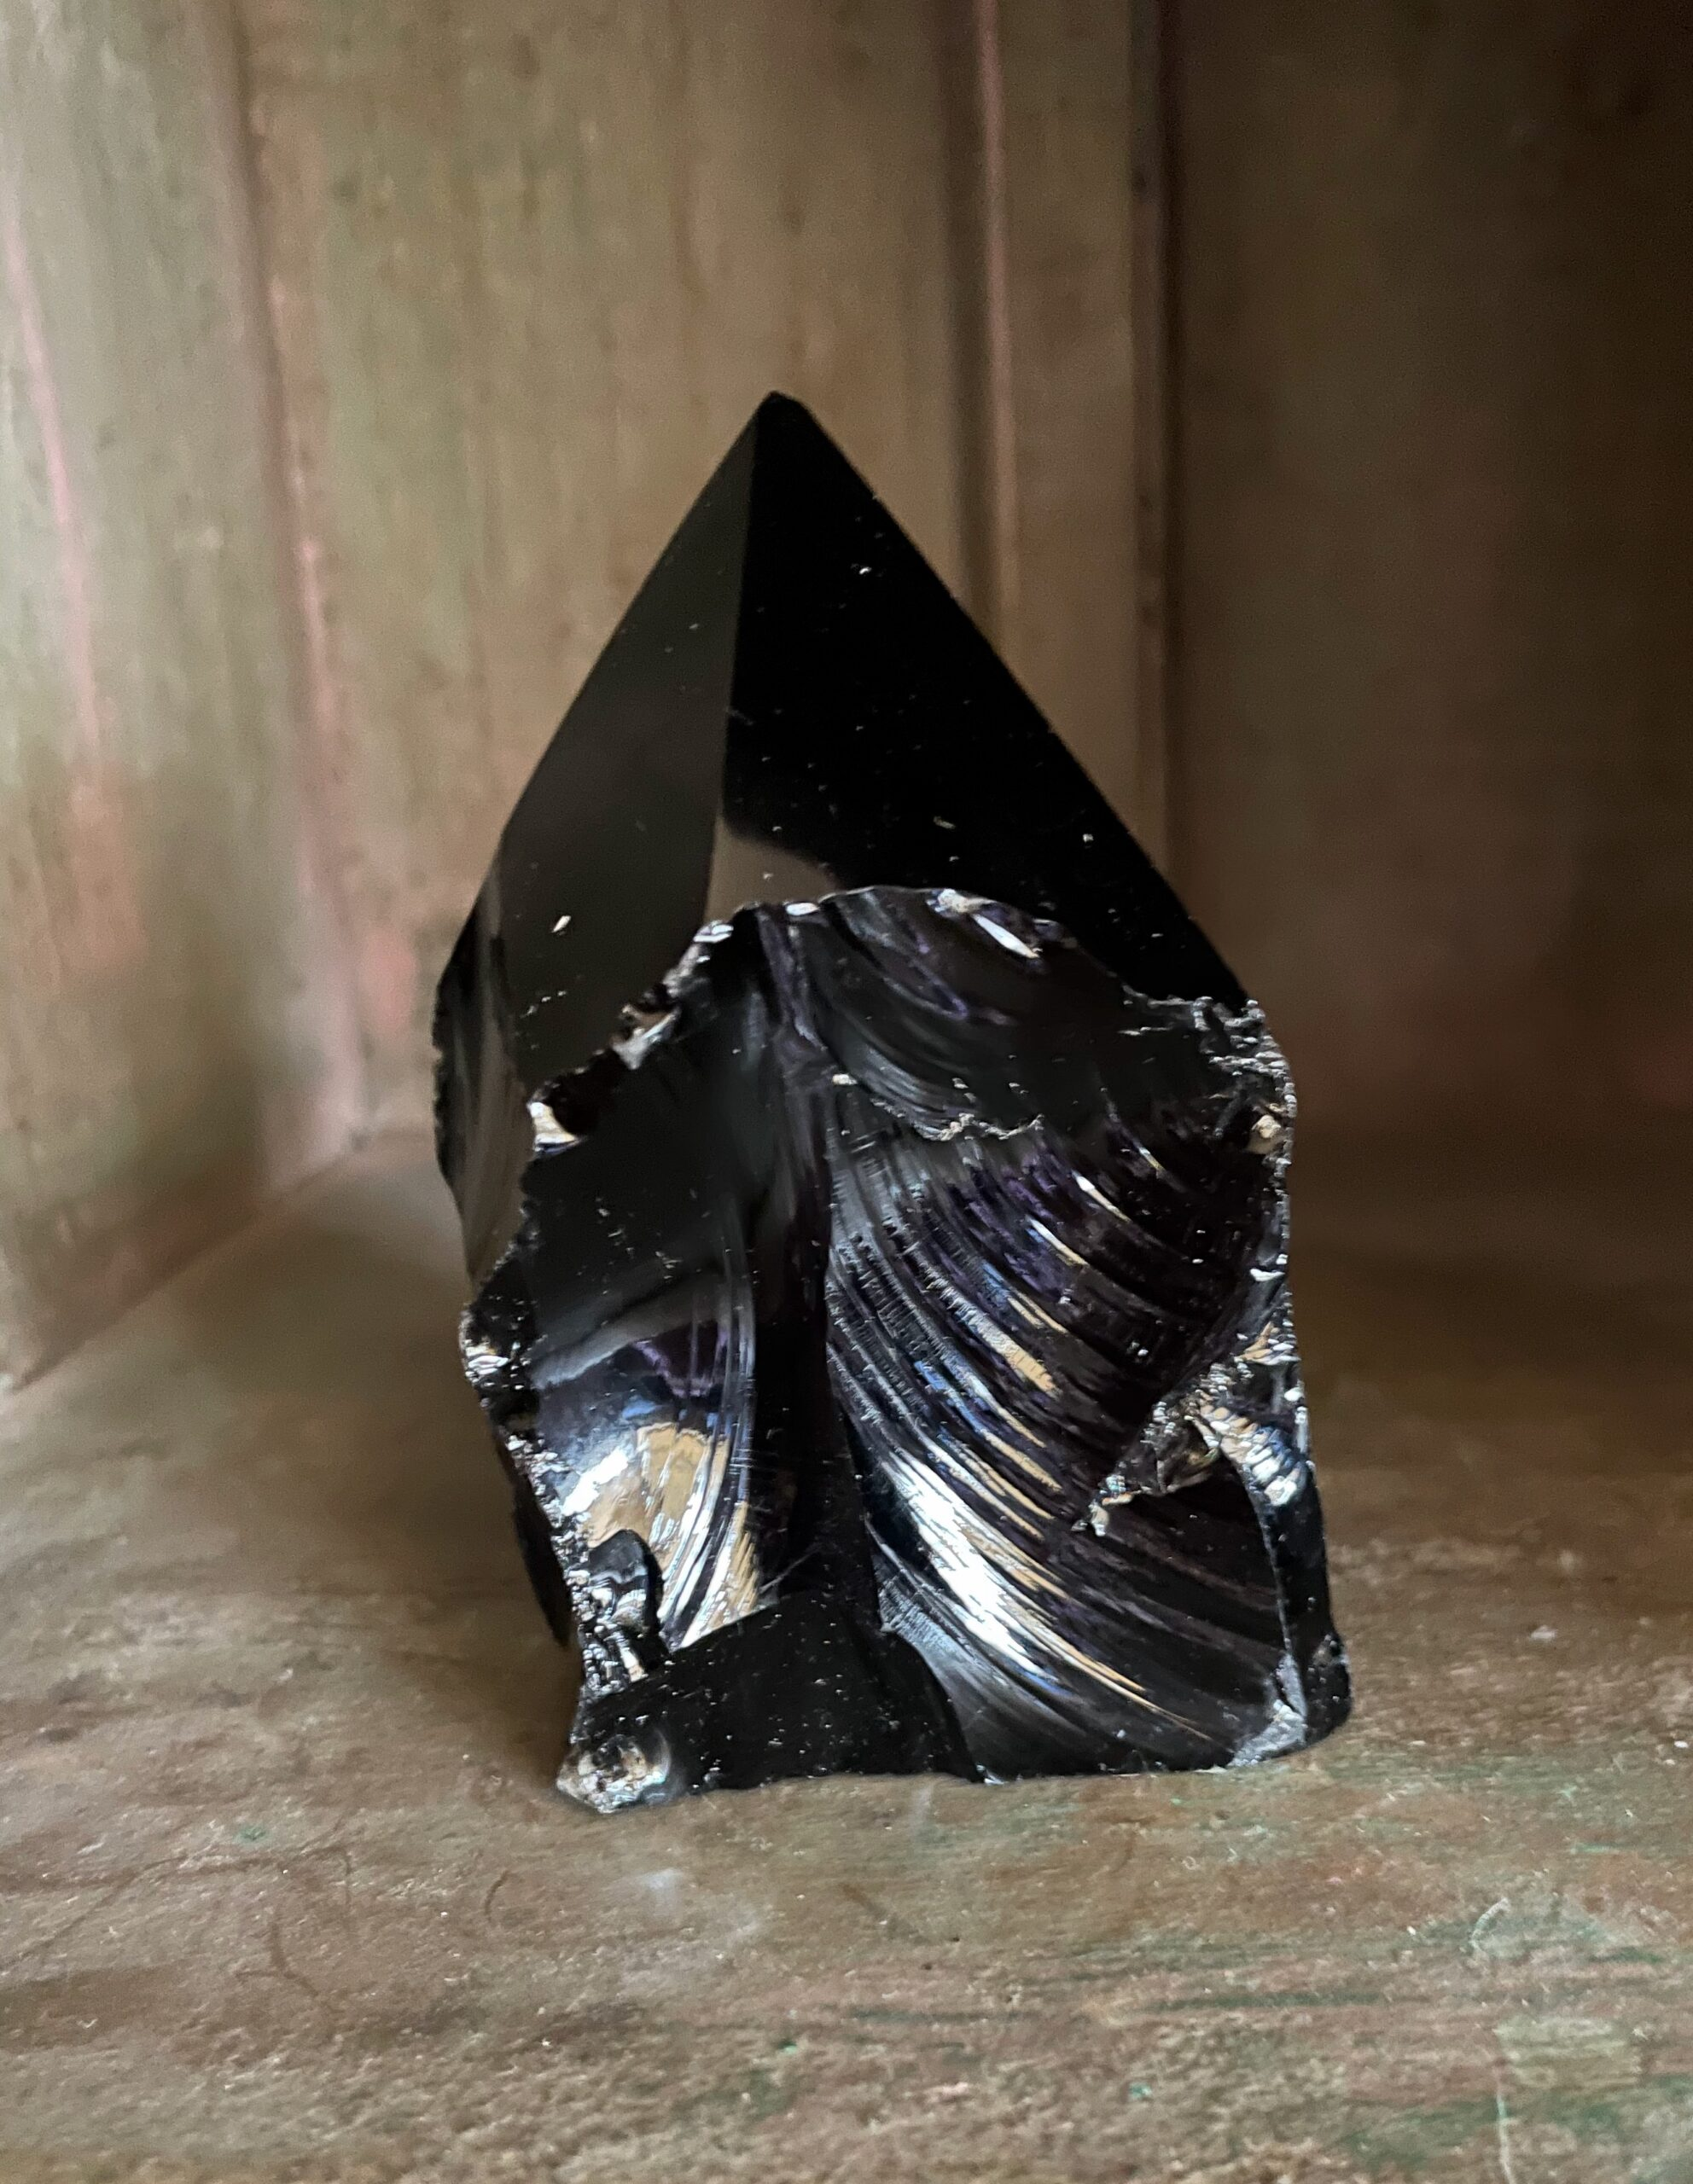 Black Obsidian Crystal Point